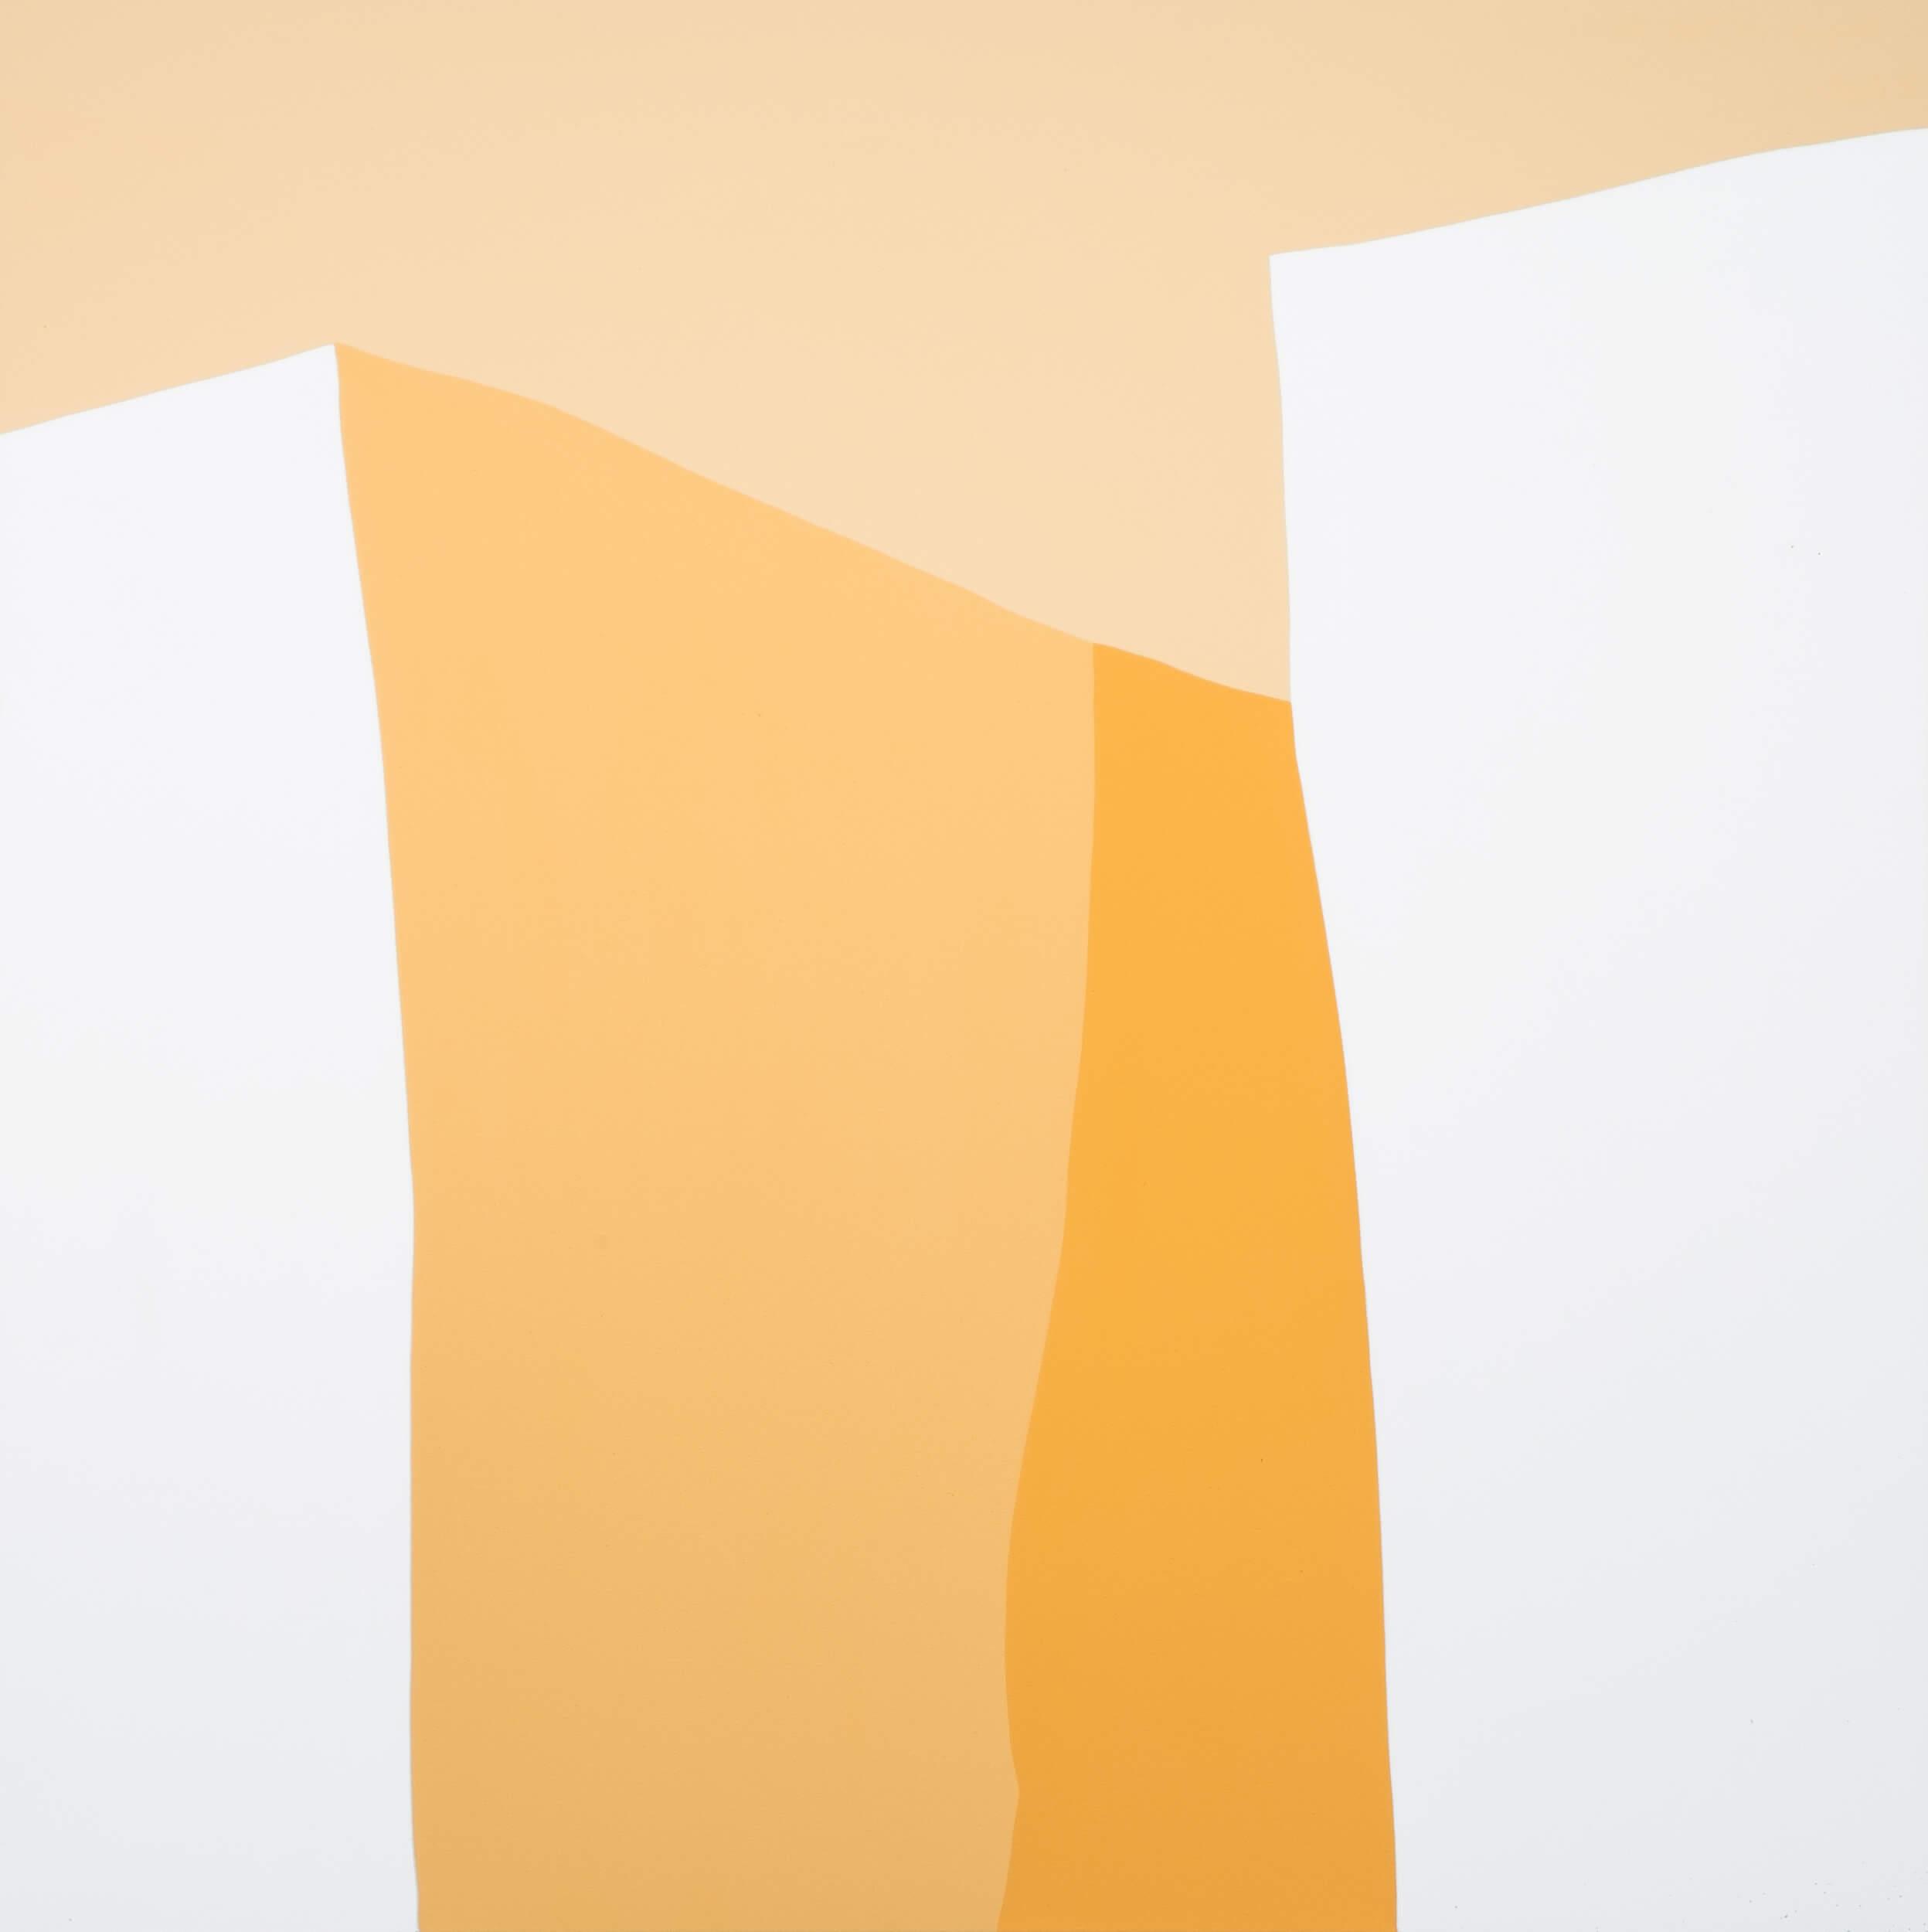 Paul Kremer Hopper 31, 2021 acrylic on canvas 48 x 48 in. (121.92 x 121.92 cm.)